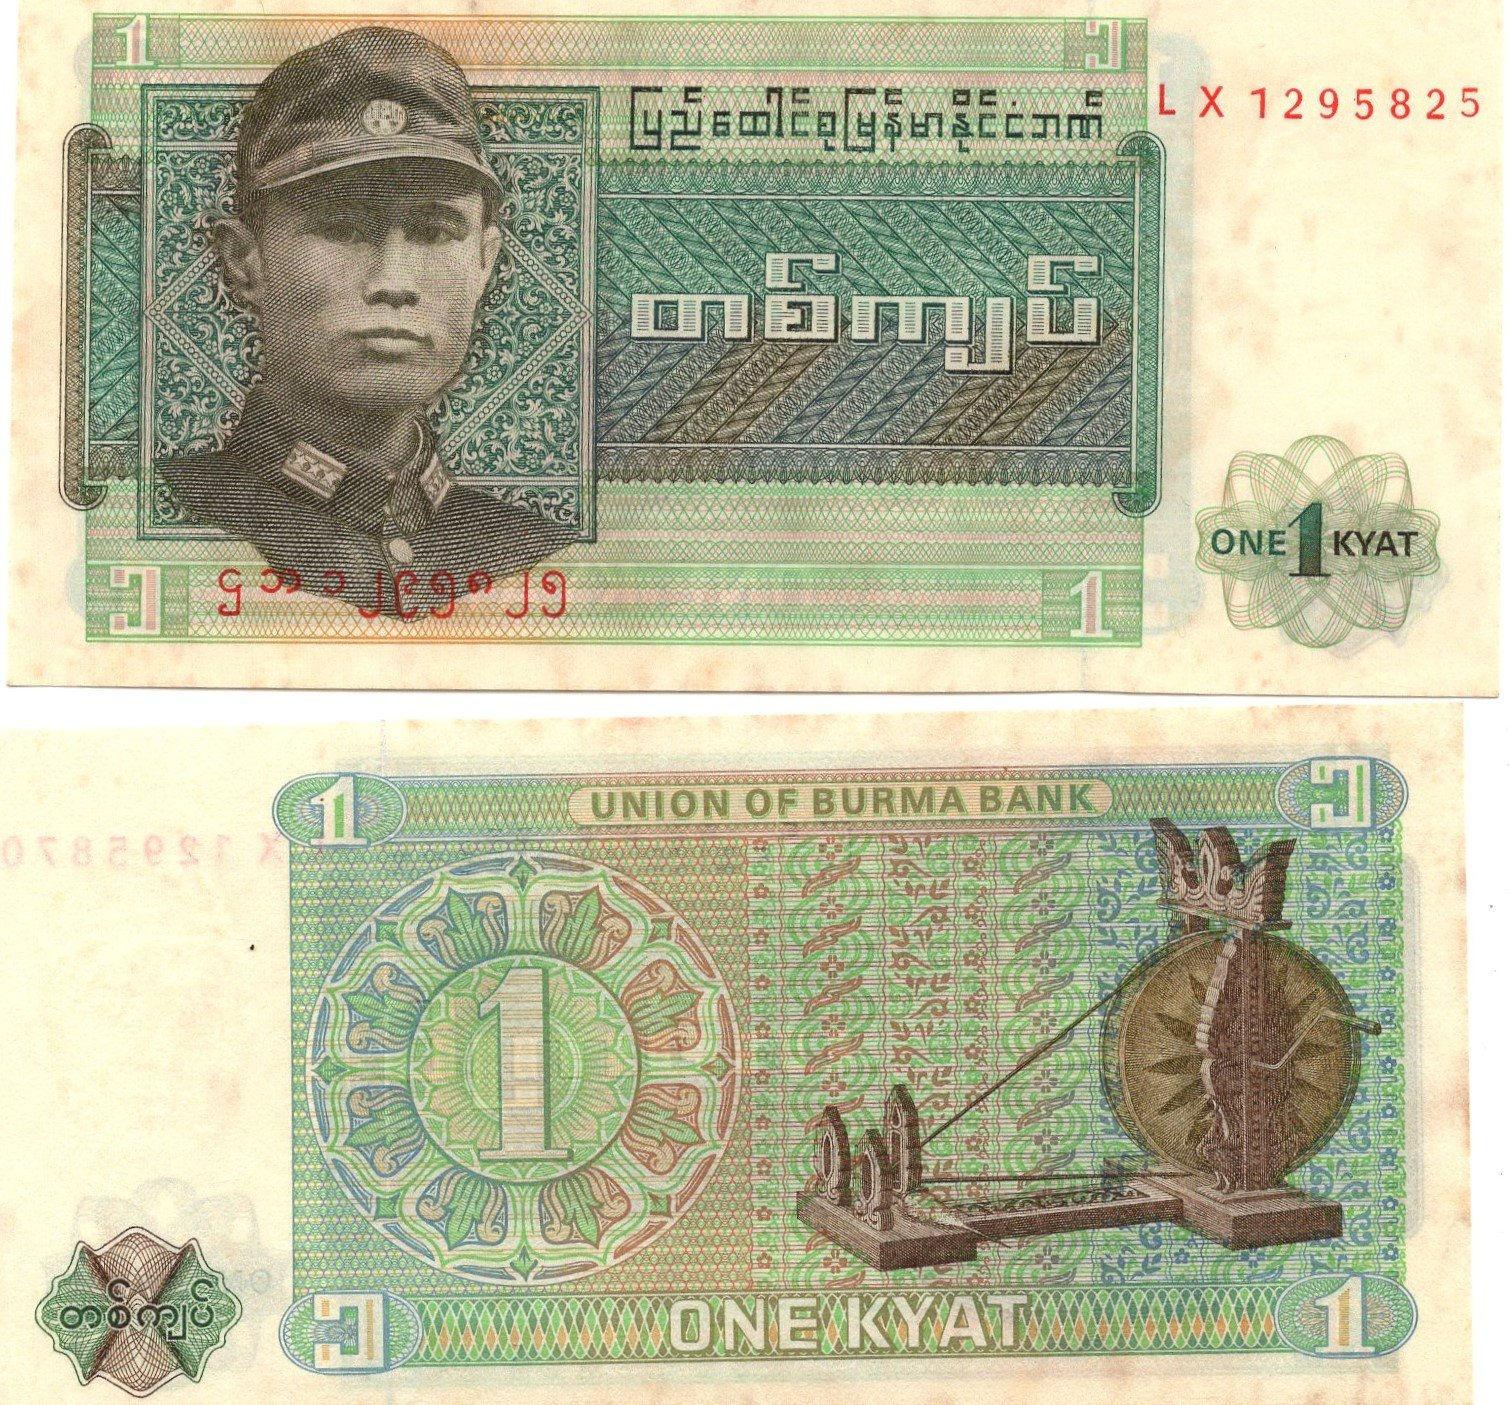 Burma 1 kyat banknote for sale